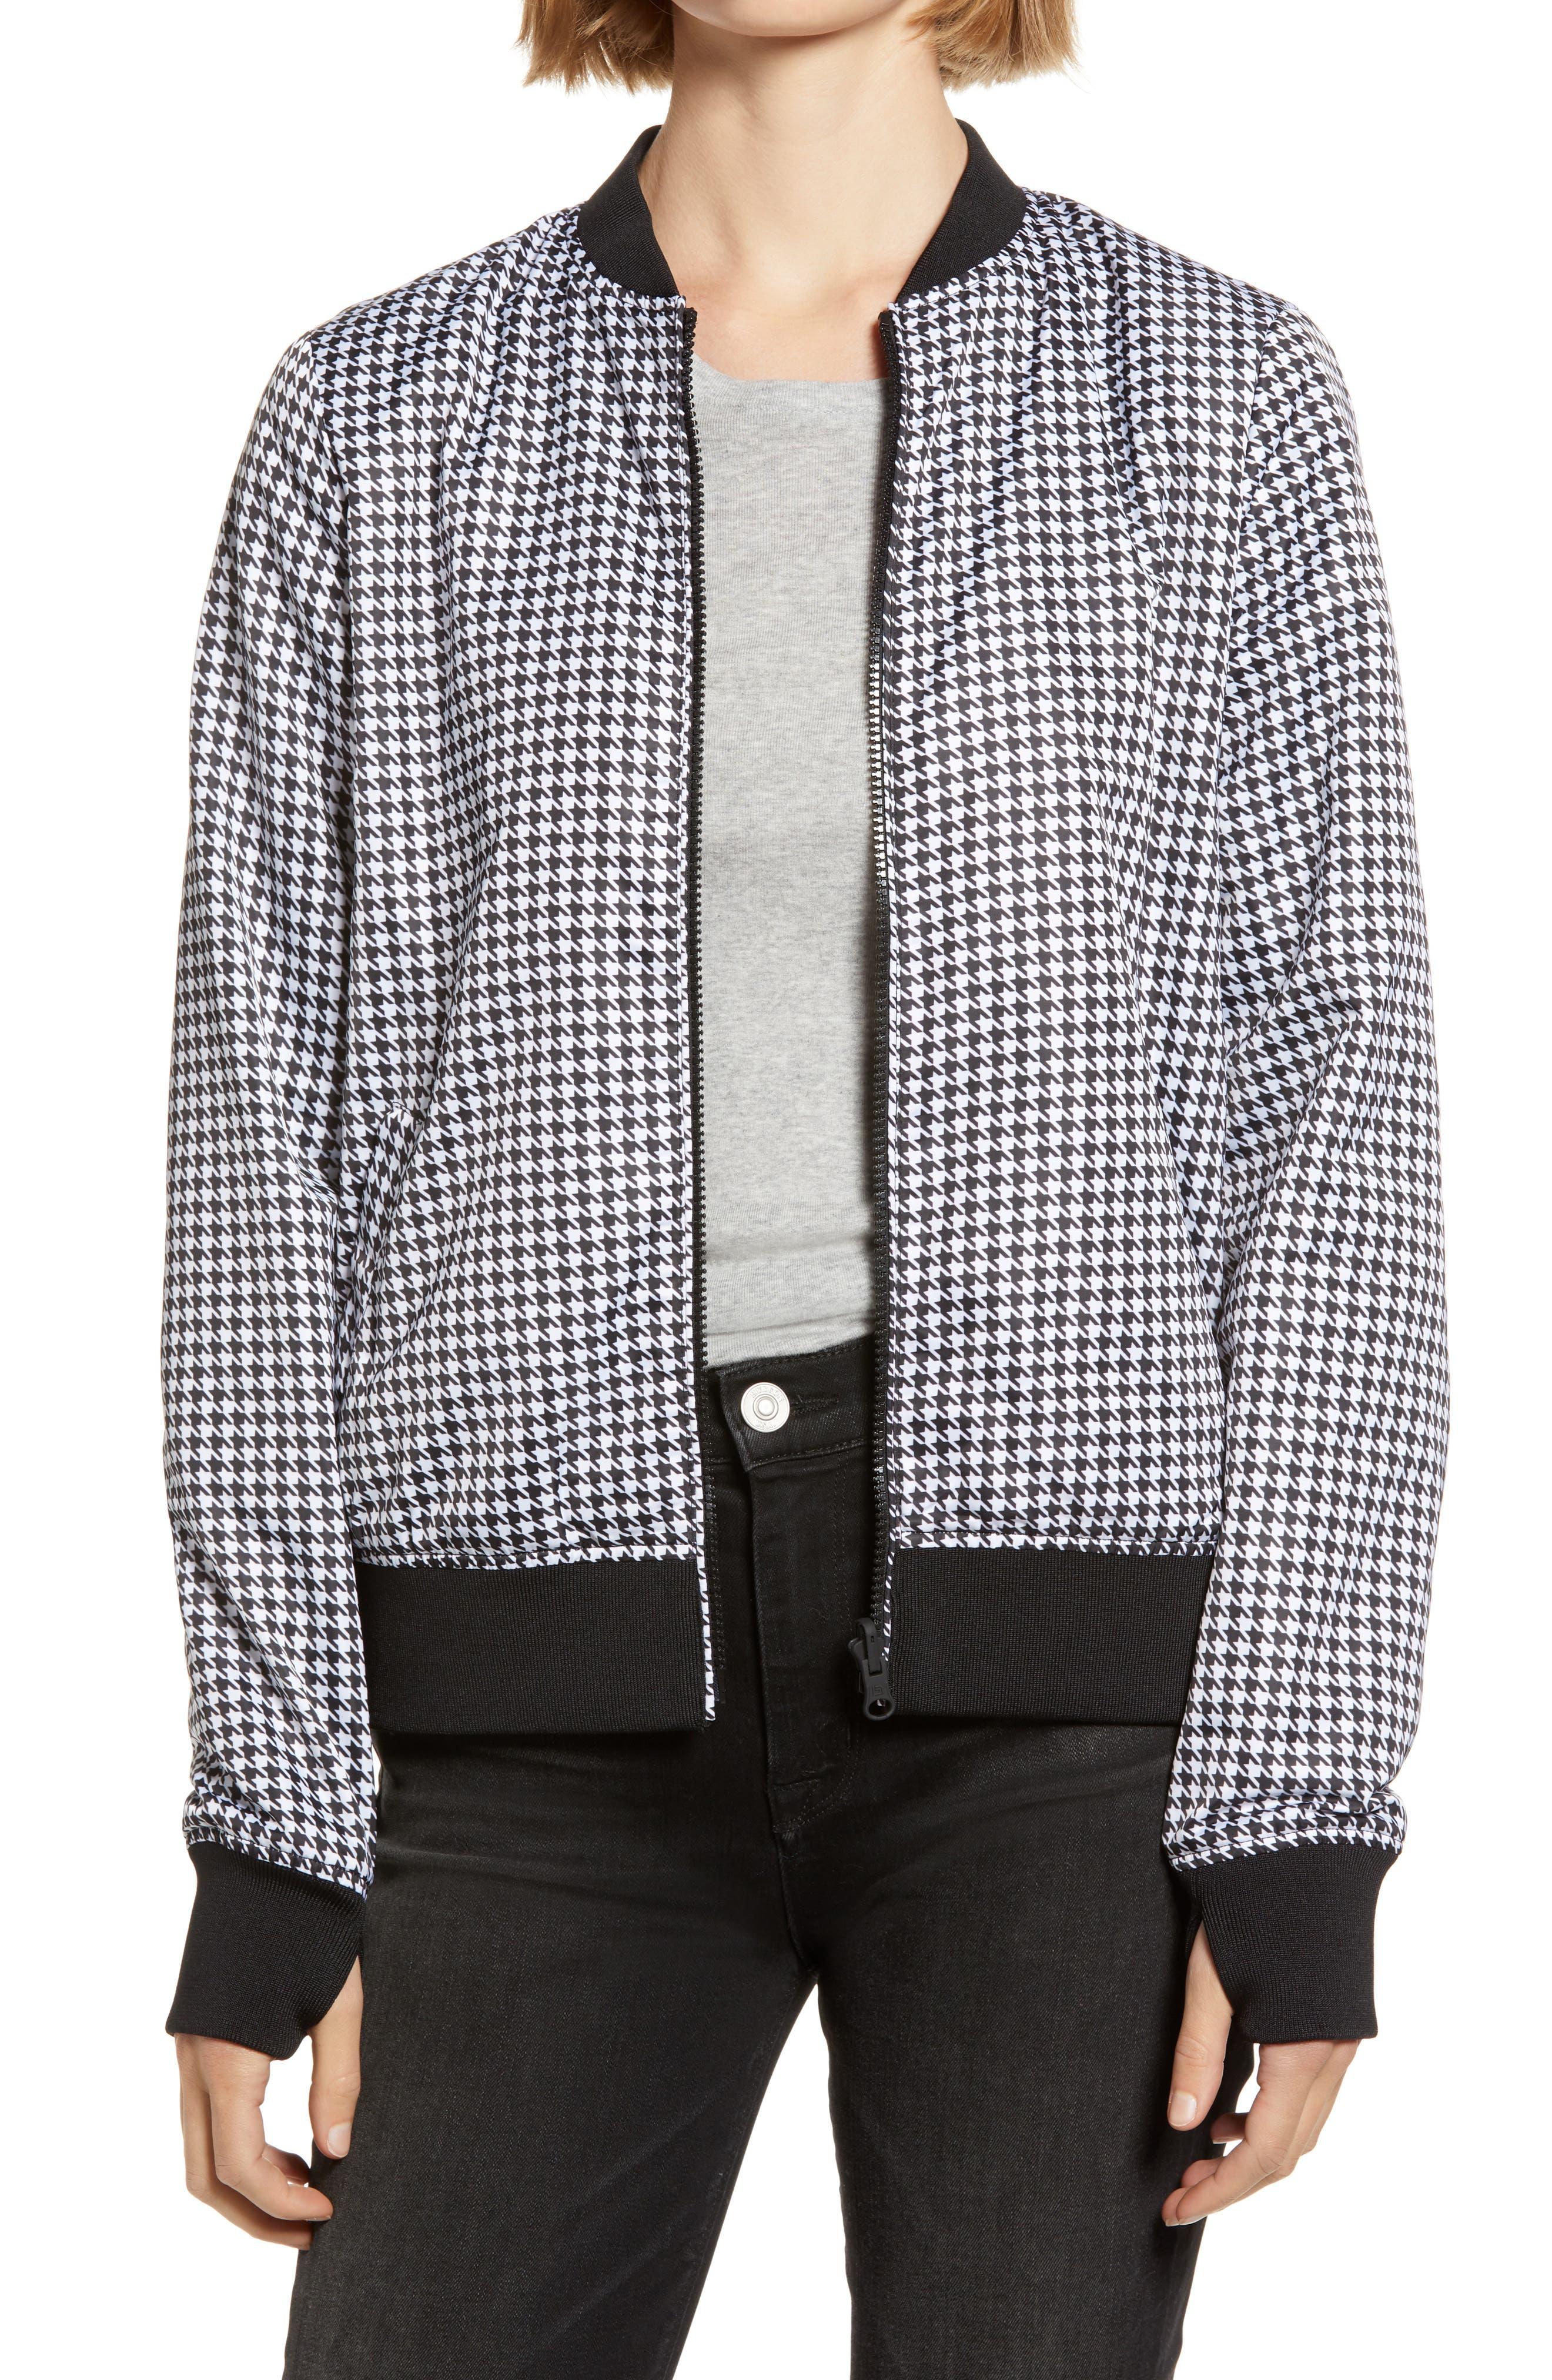 80s Windbreakers, Jackets, Coats Womens Blanc Noir Reversible Bomber Jacket Size Small - Black $89.50 AT vintagedancer.com